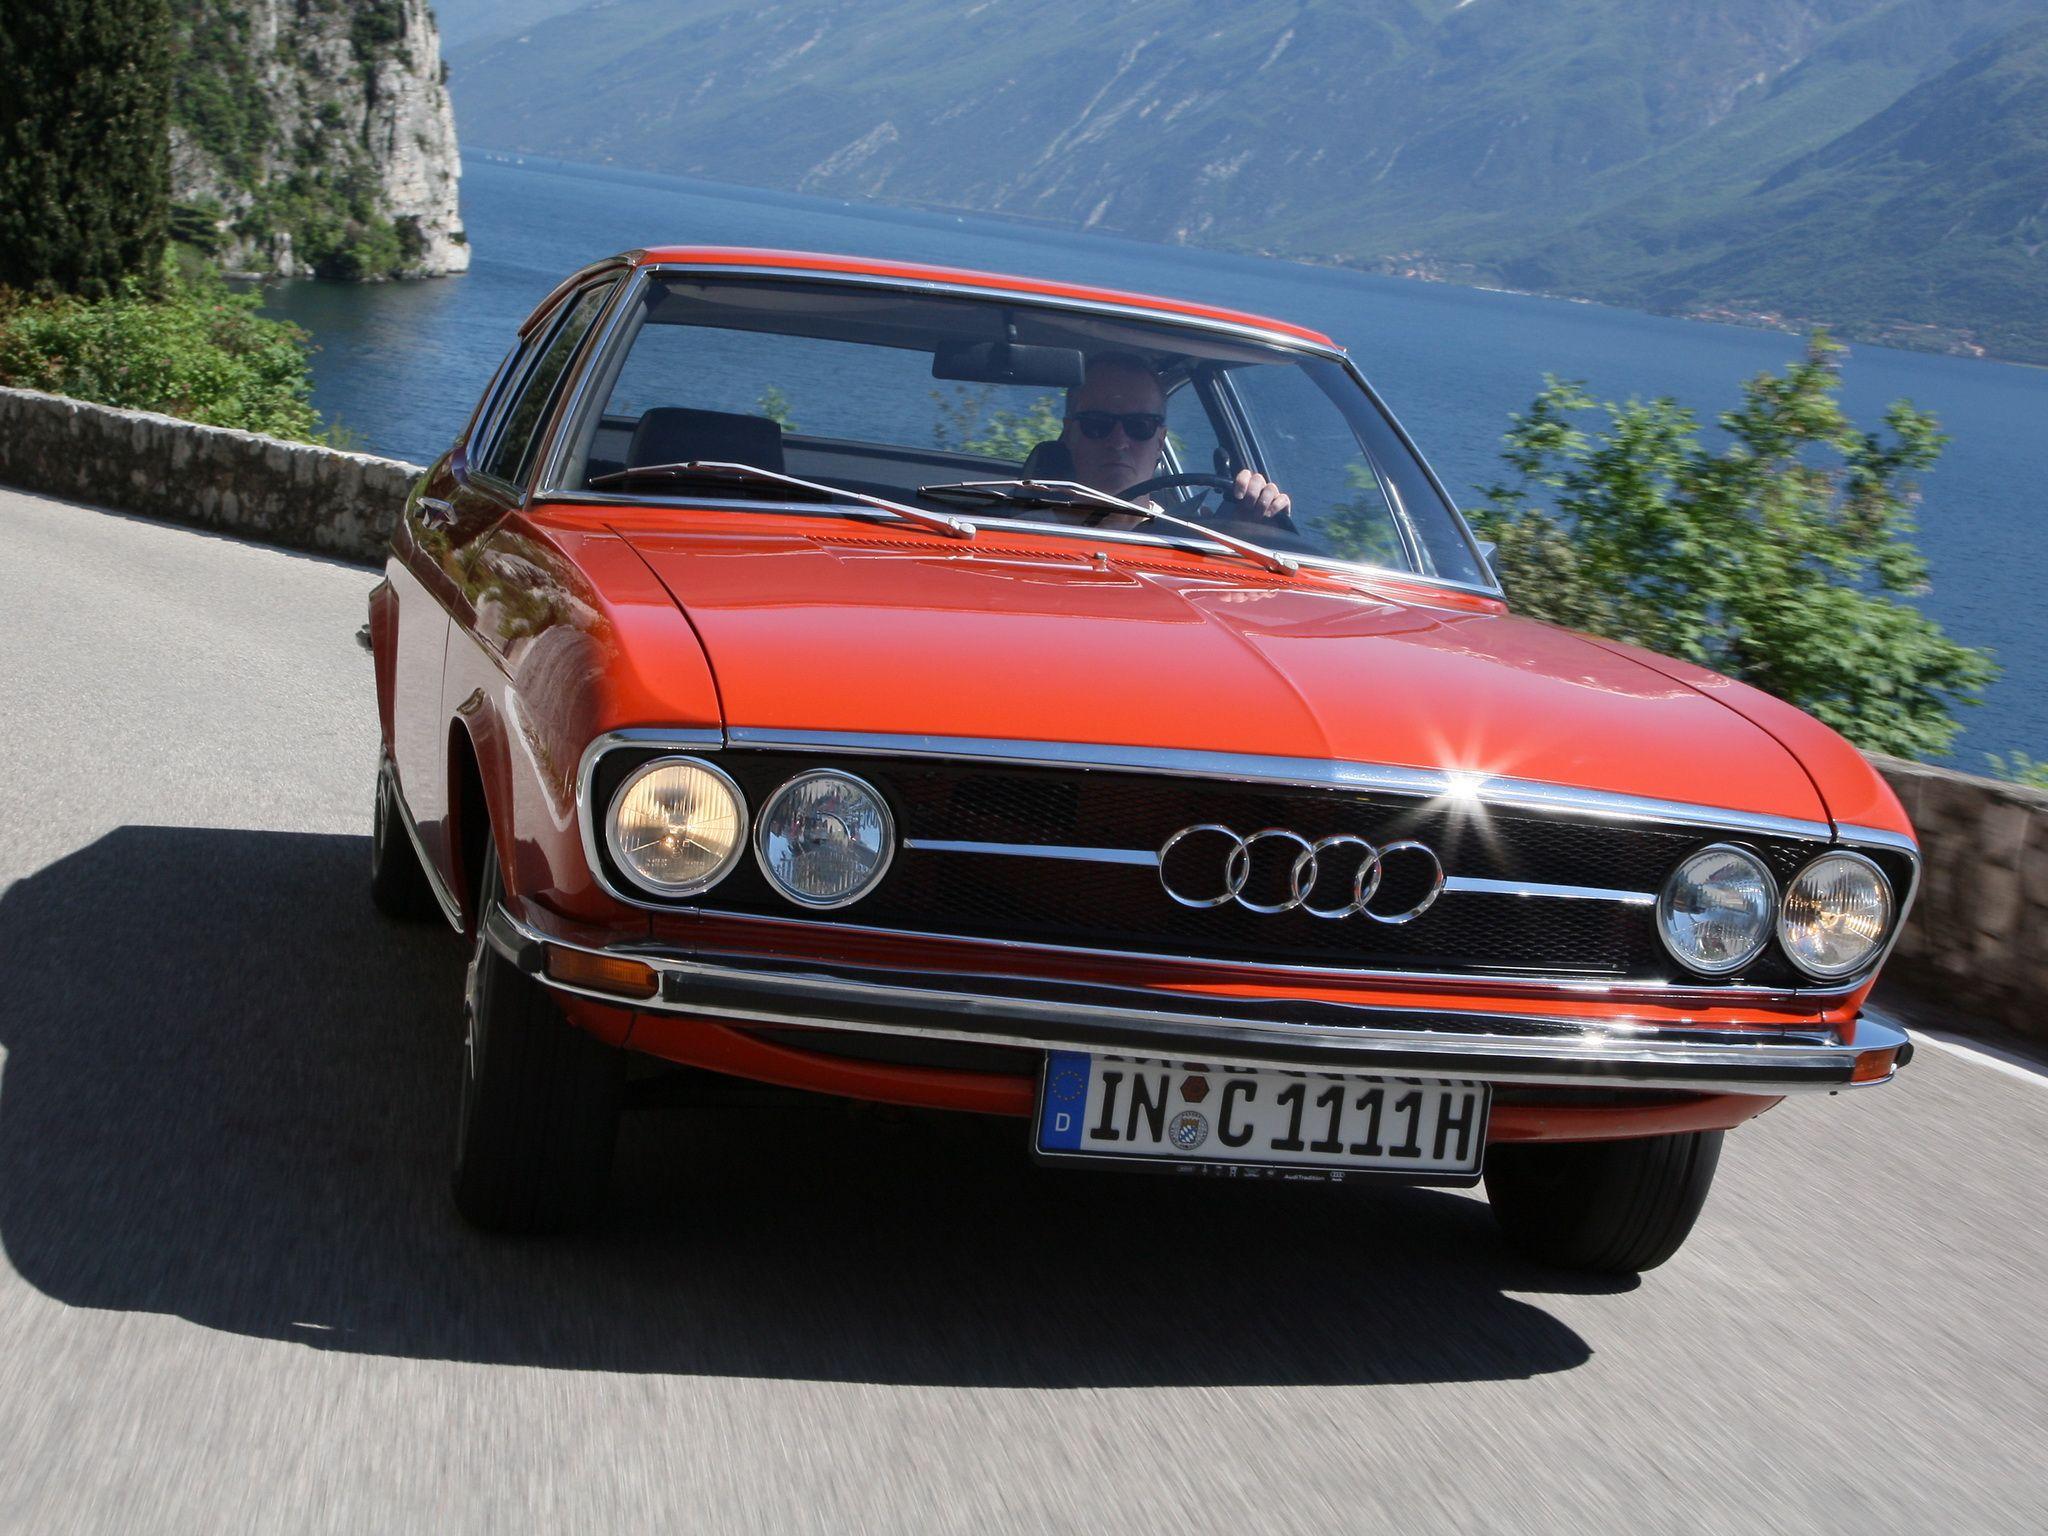 1970-76 Audi 100 Coupe S (C1) | Audi 100, Audi 100 coupé s ...